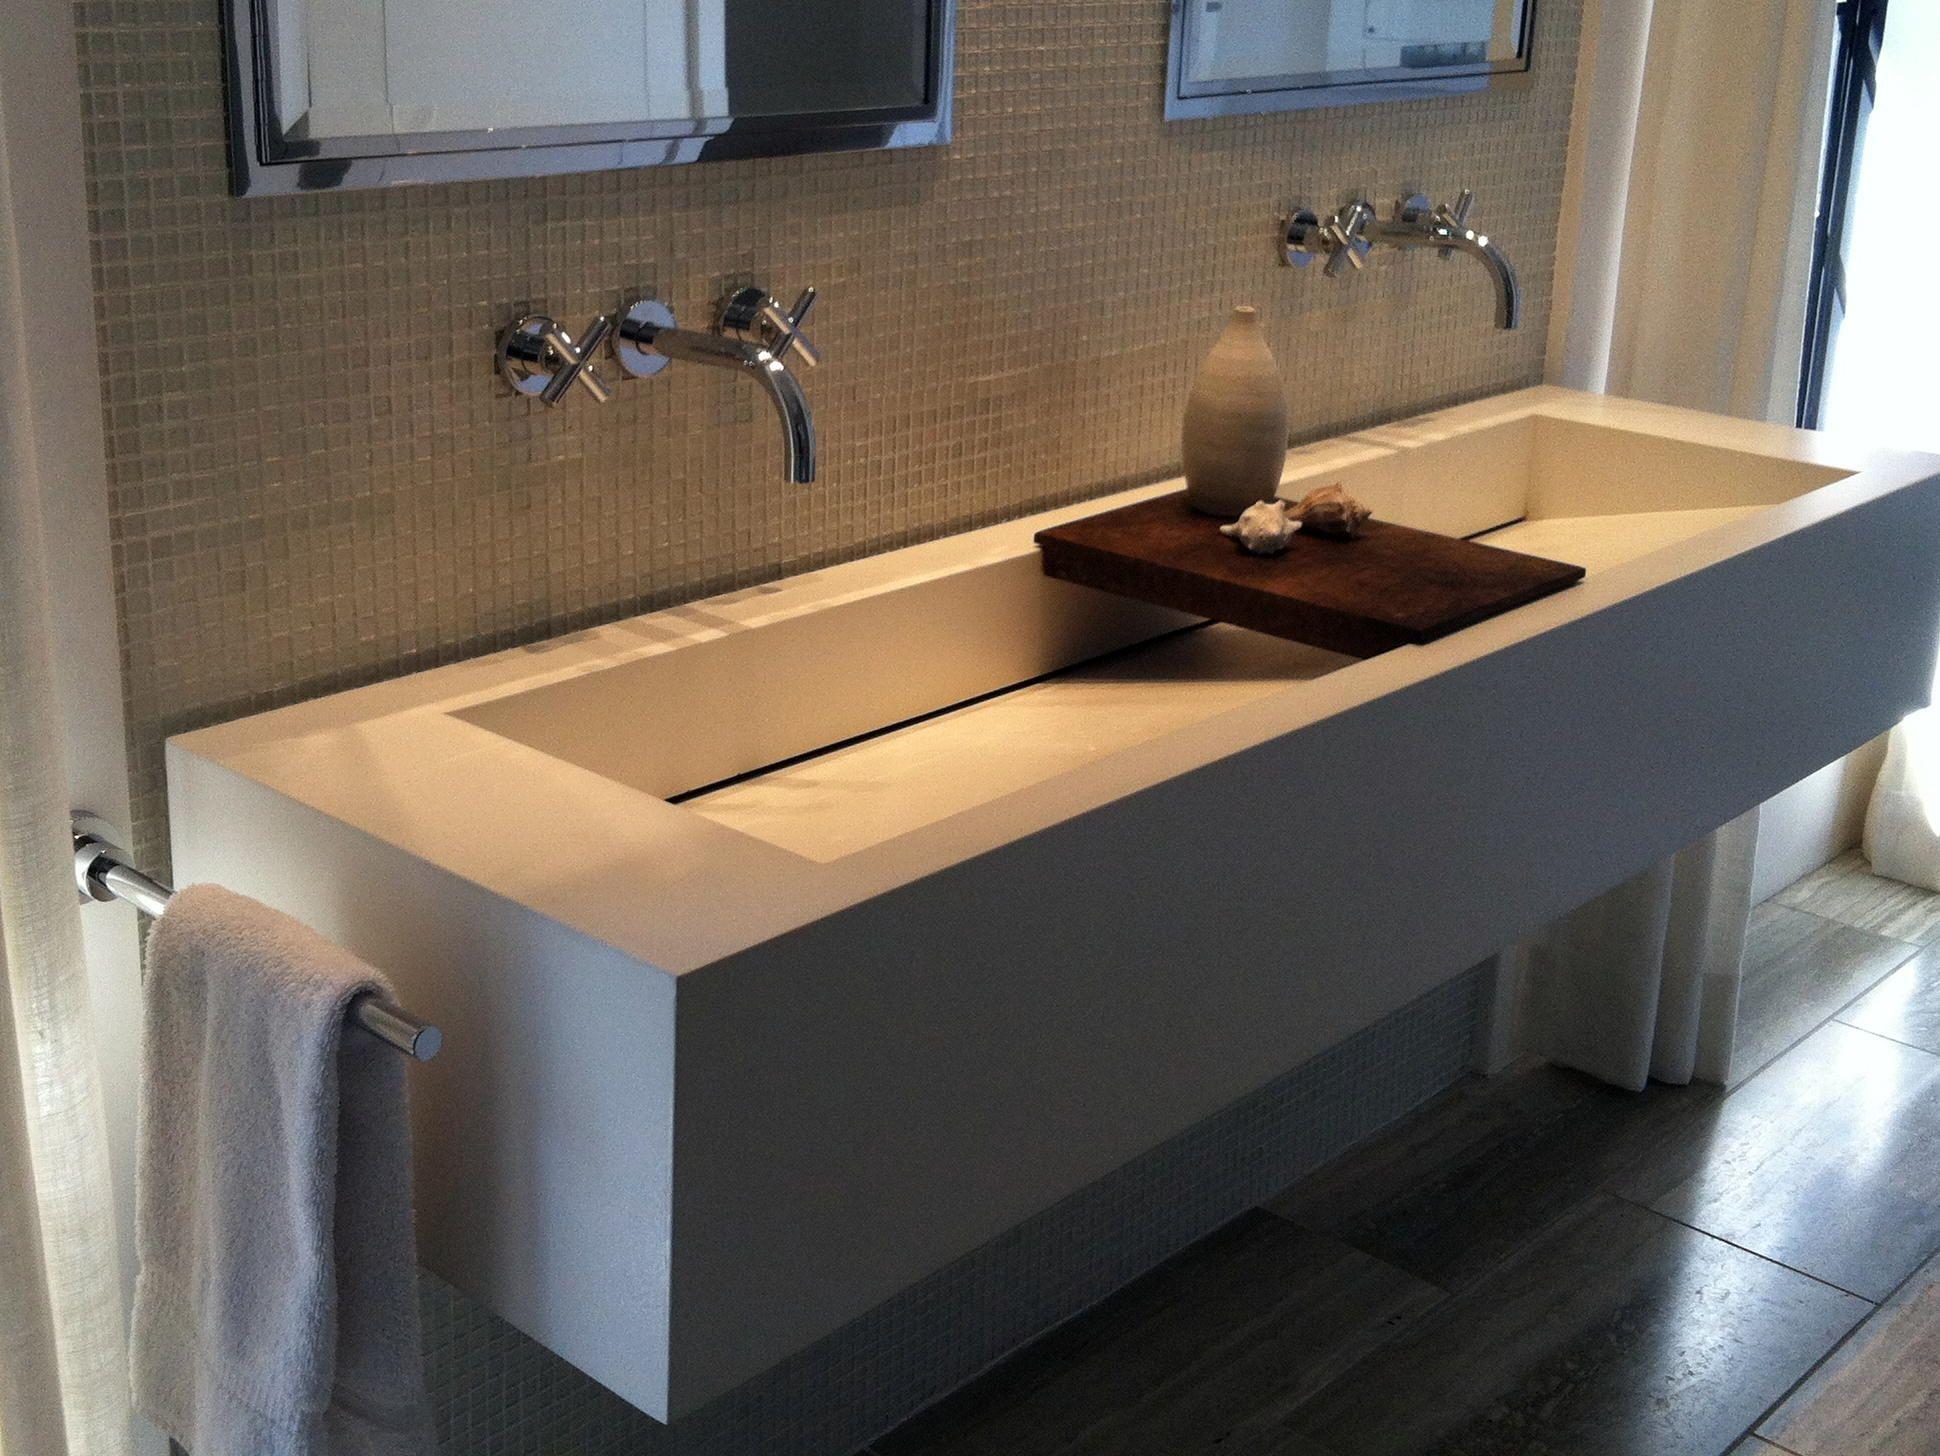 White Concrete Floating Bathroom Trough Sink Added Chrome Metal